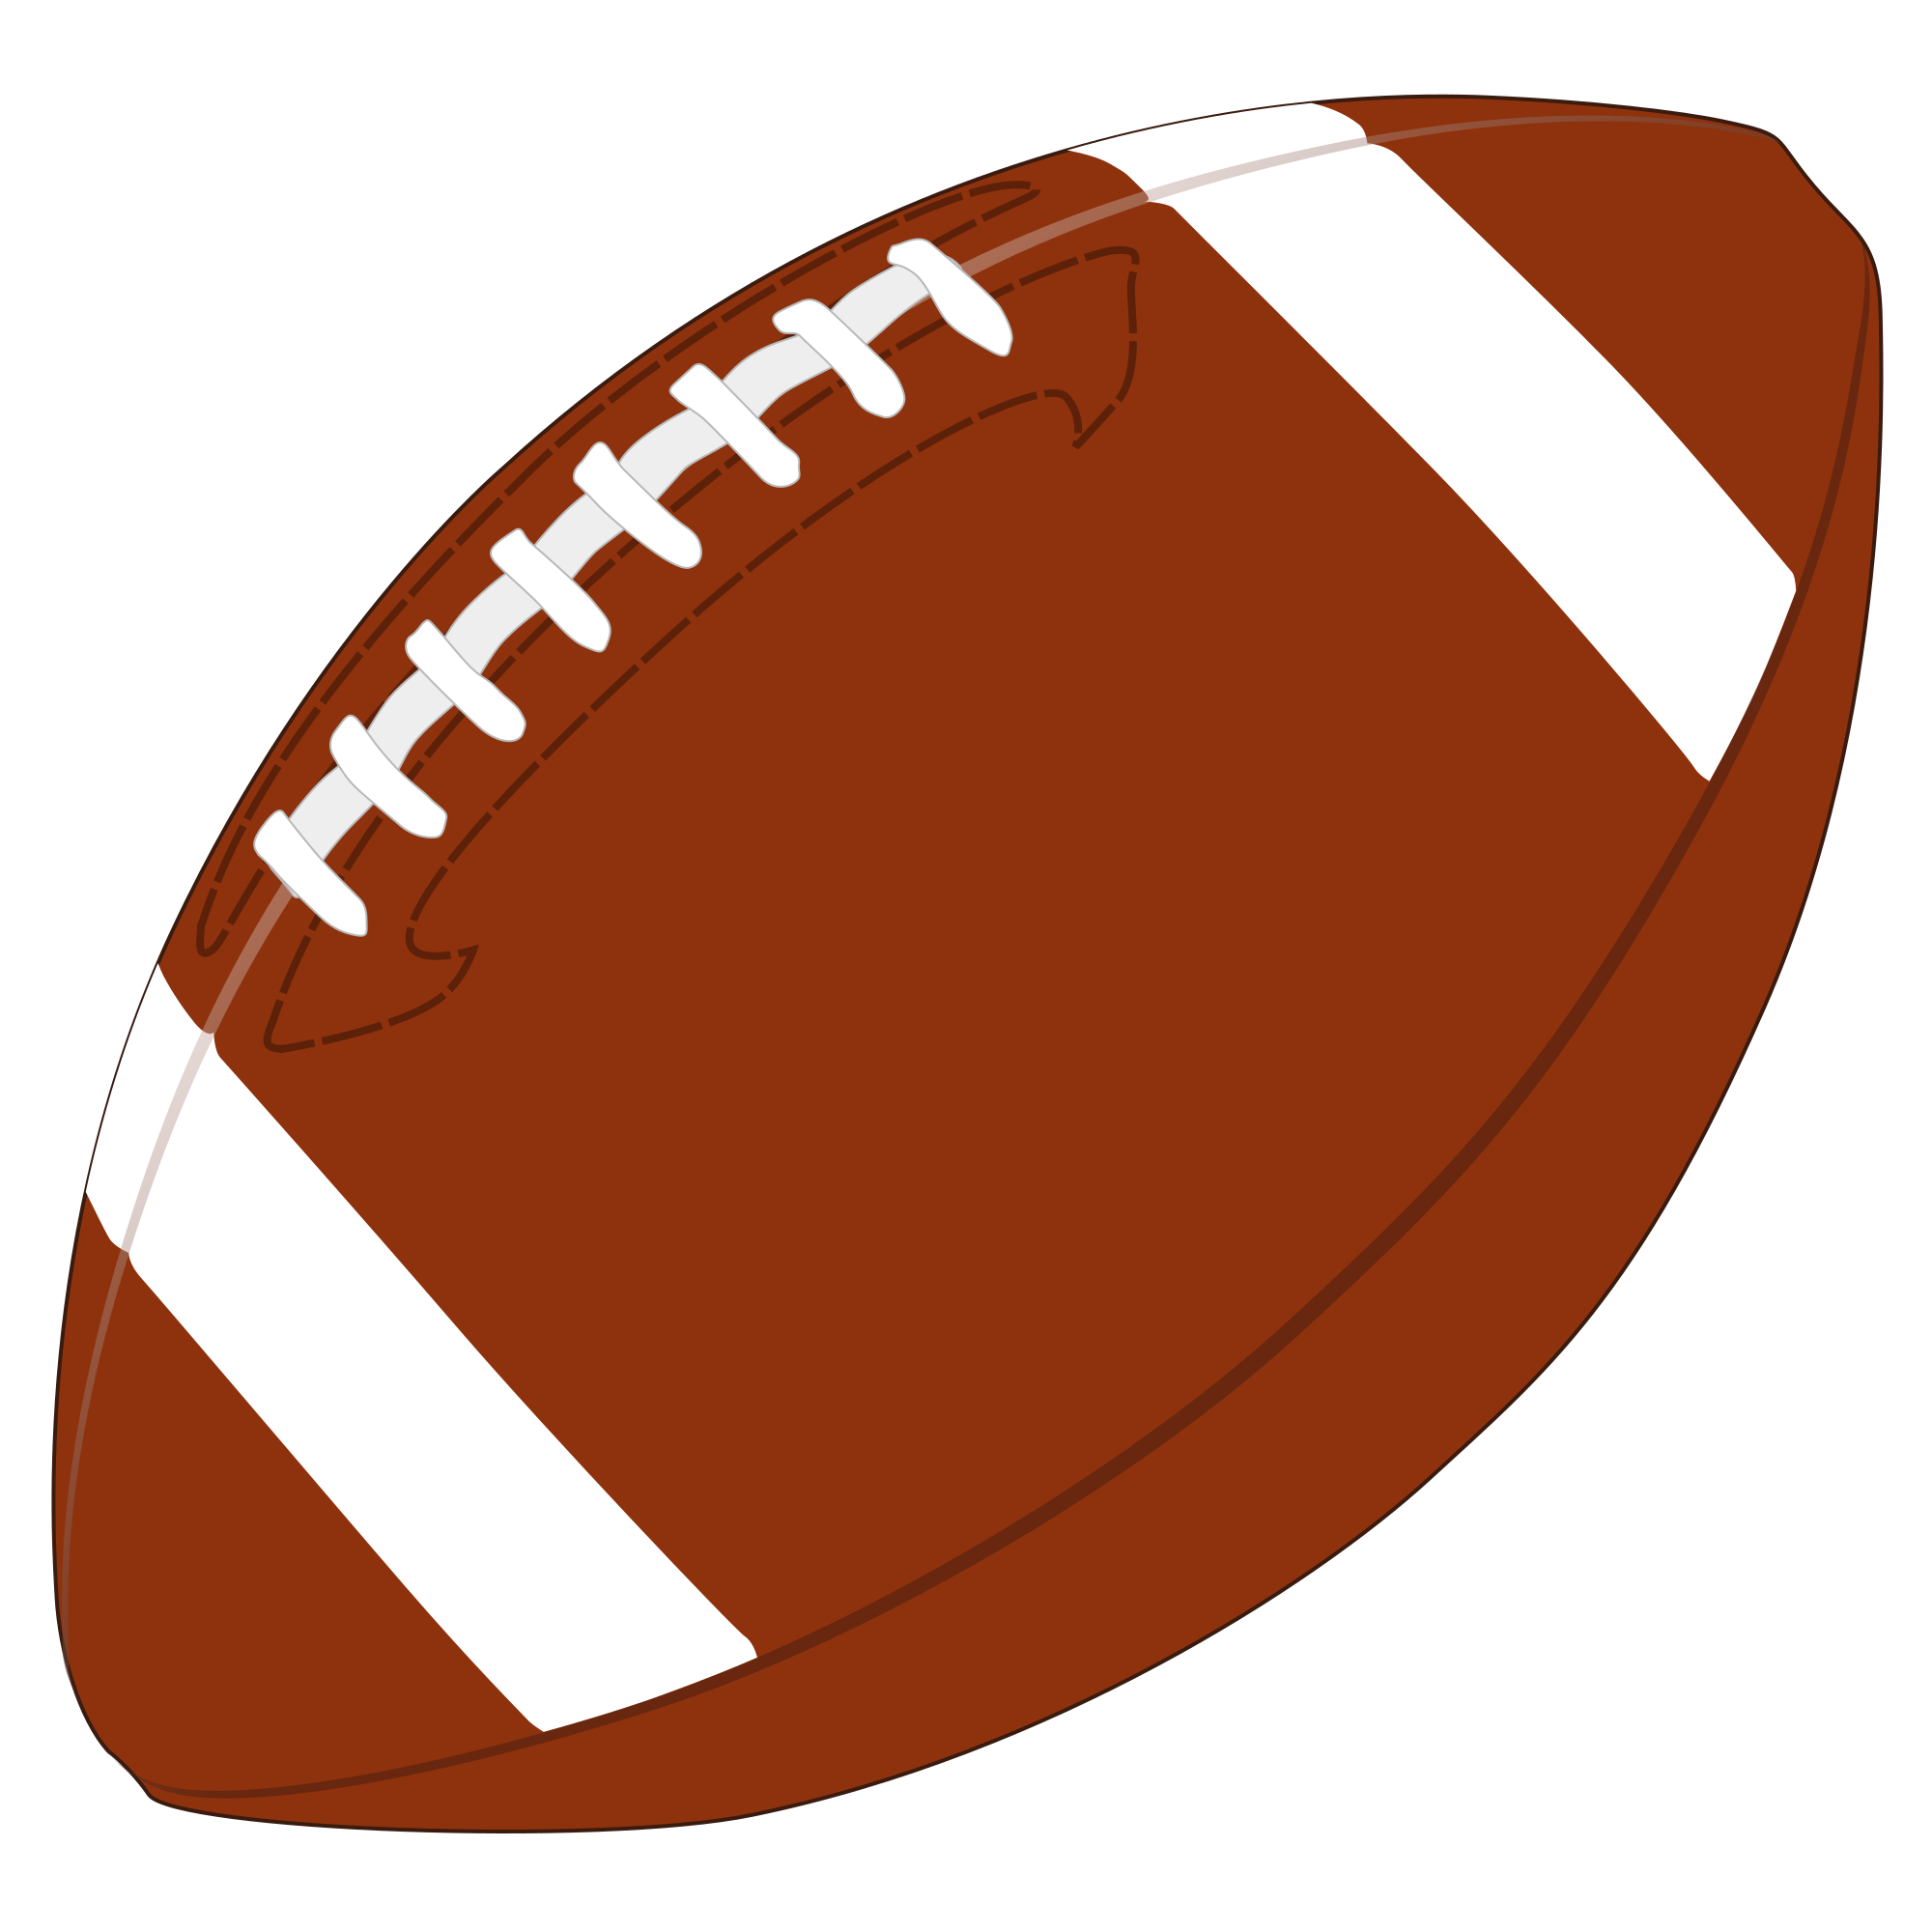 American Football Png Image American Football Png Image Americanfootballequipment In 2020 American Football Football Images Football Ball